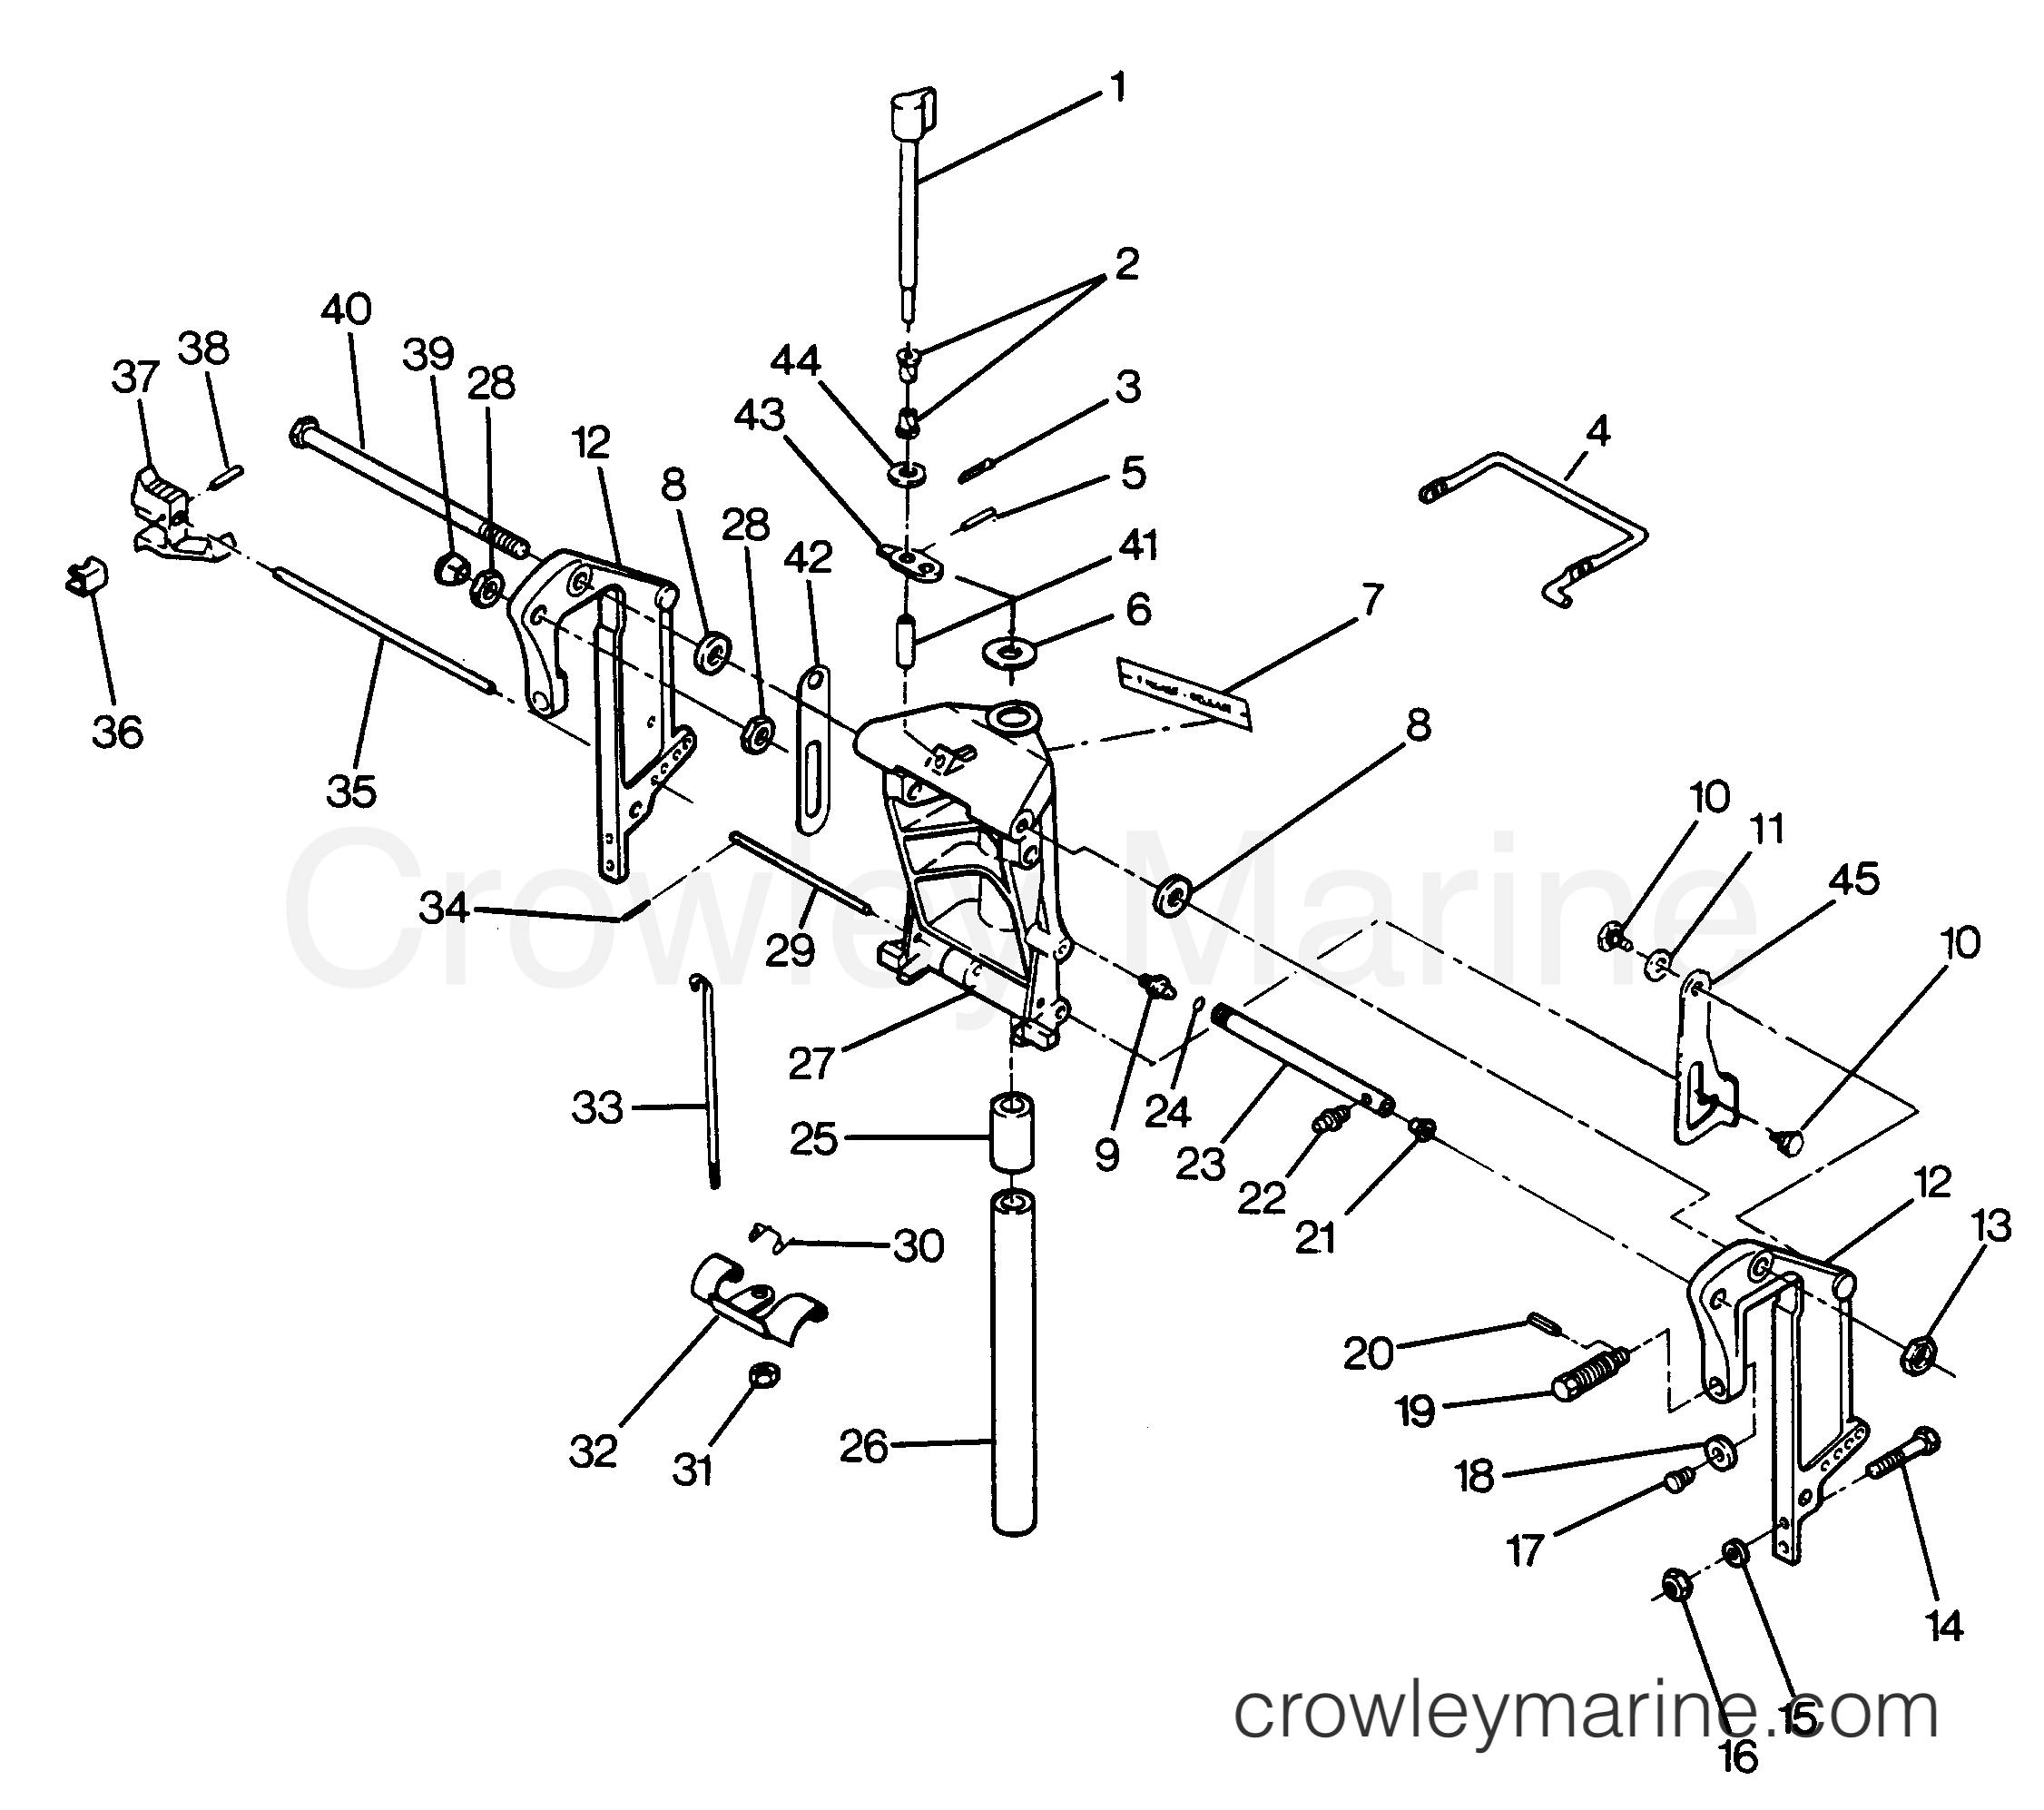 swivel bracket and stern brackets models without power trim